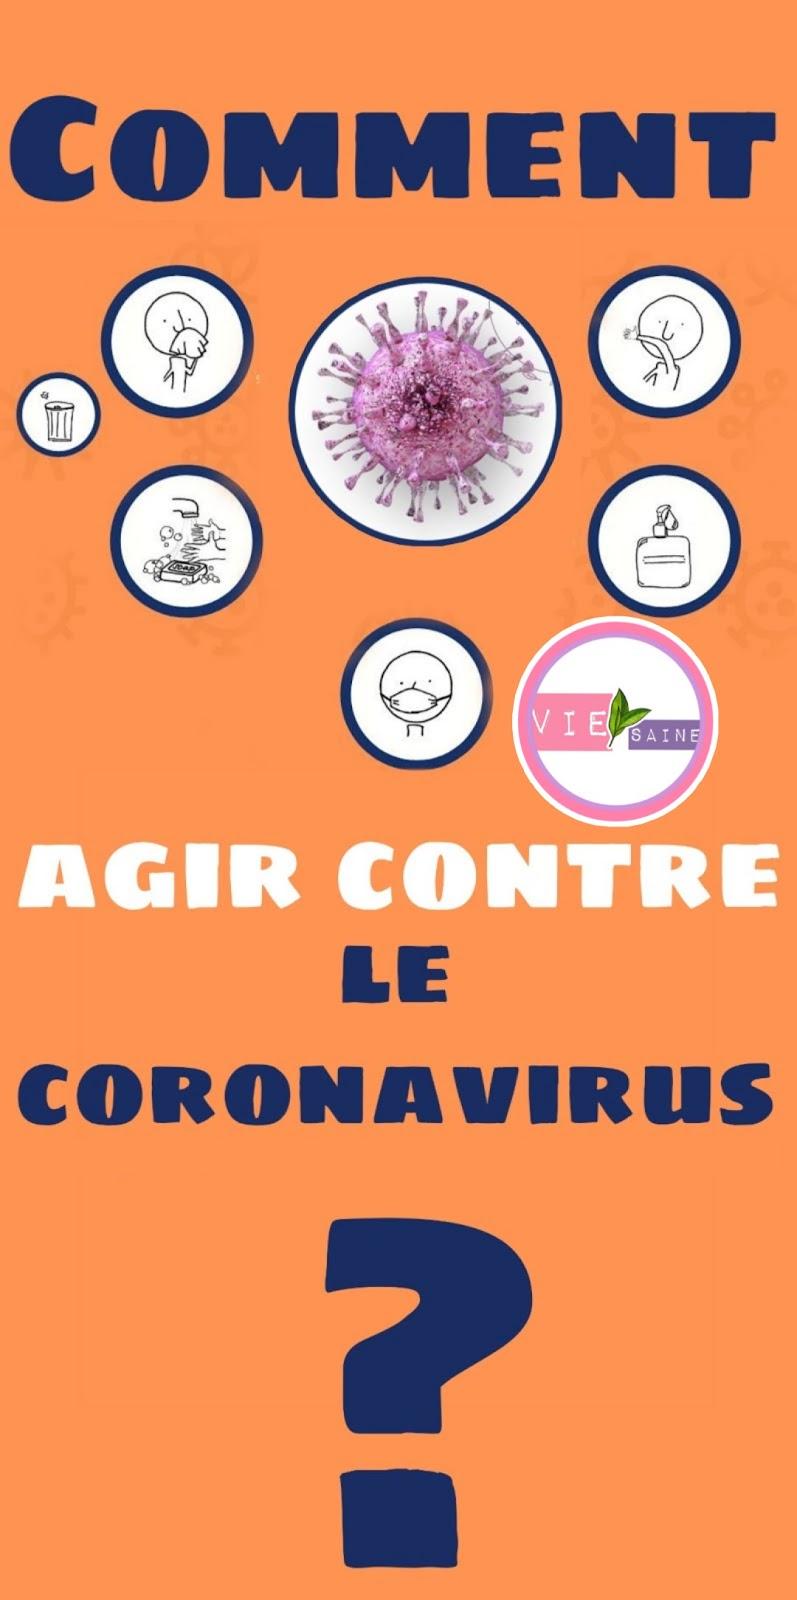 Comment agir contre le coronavirus?